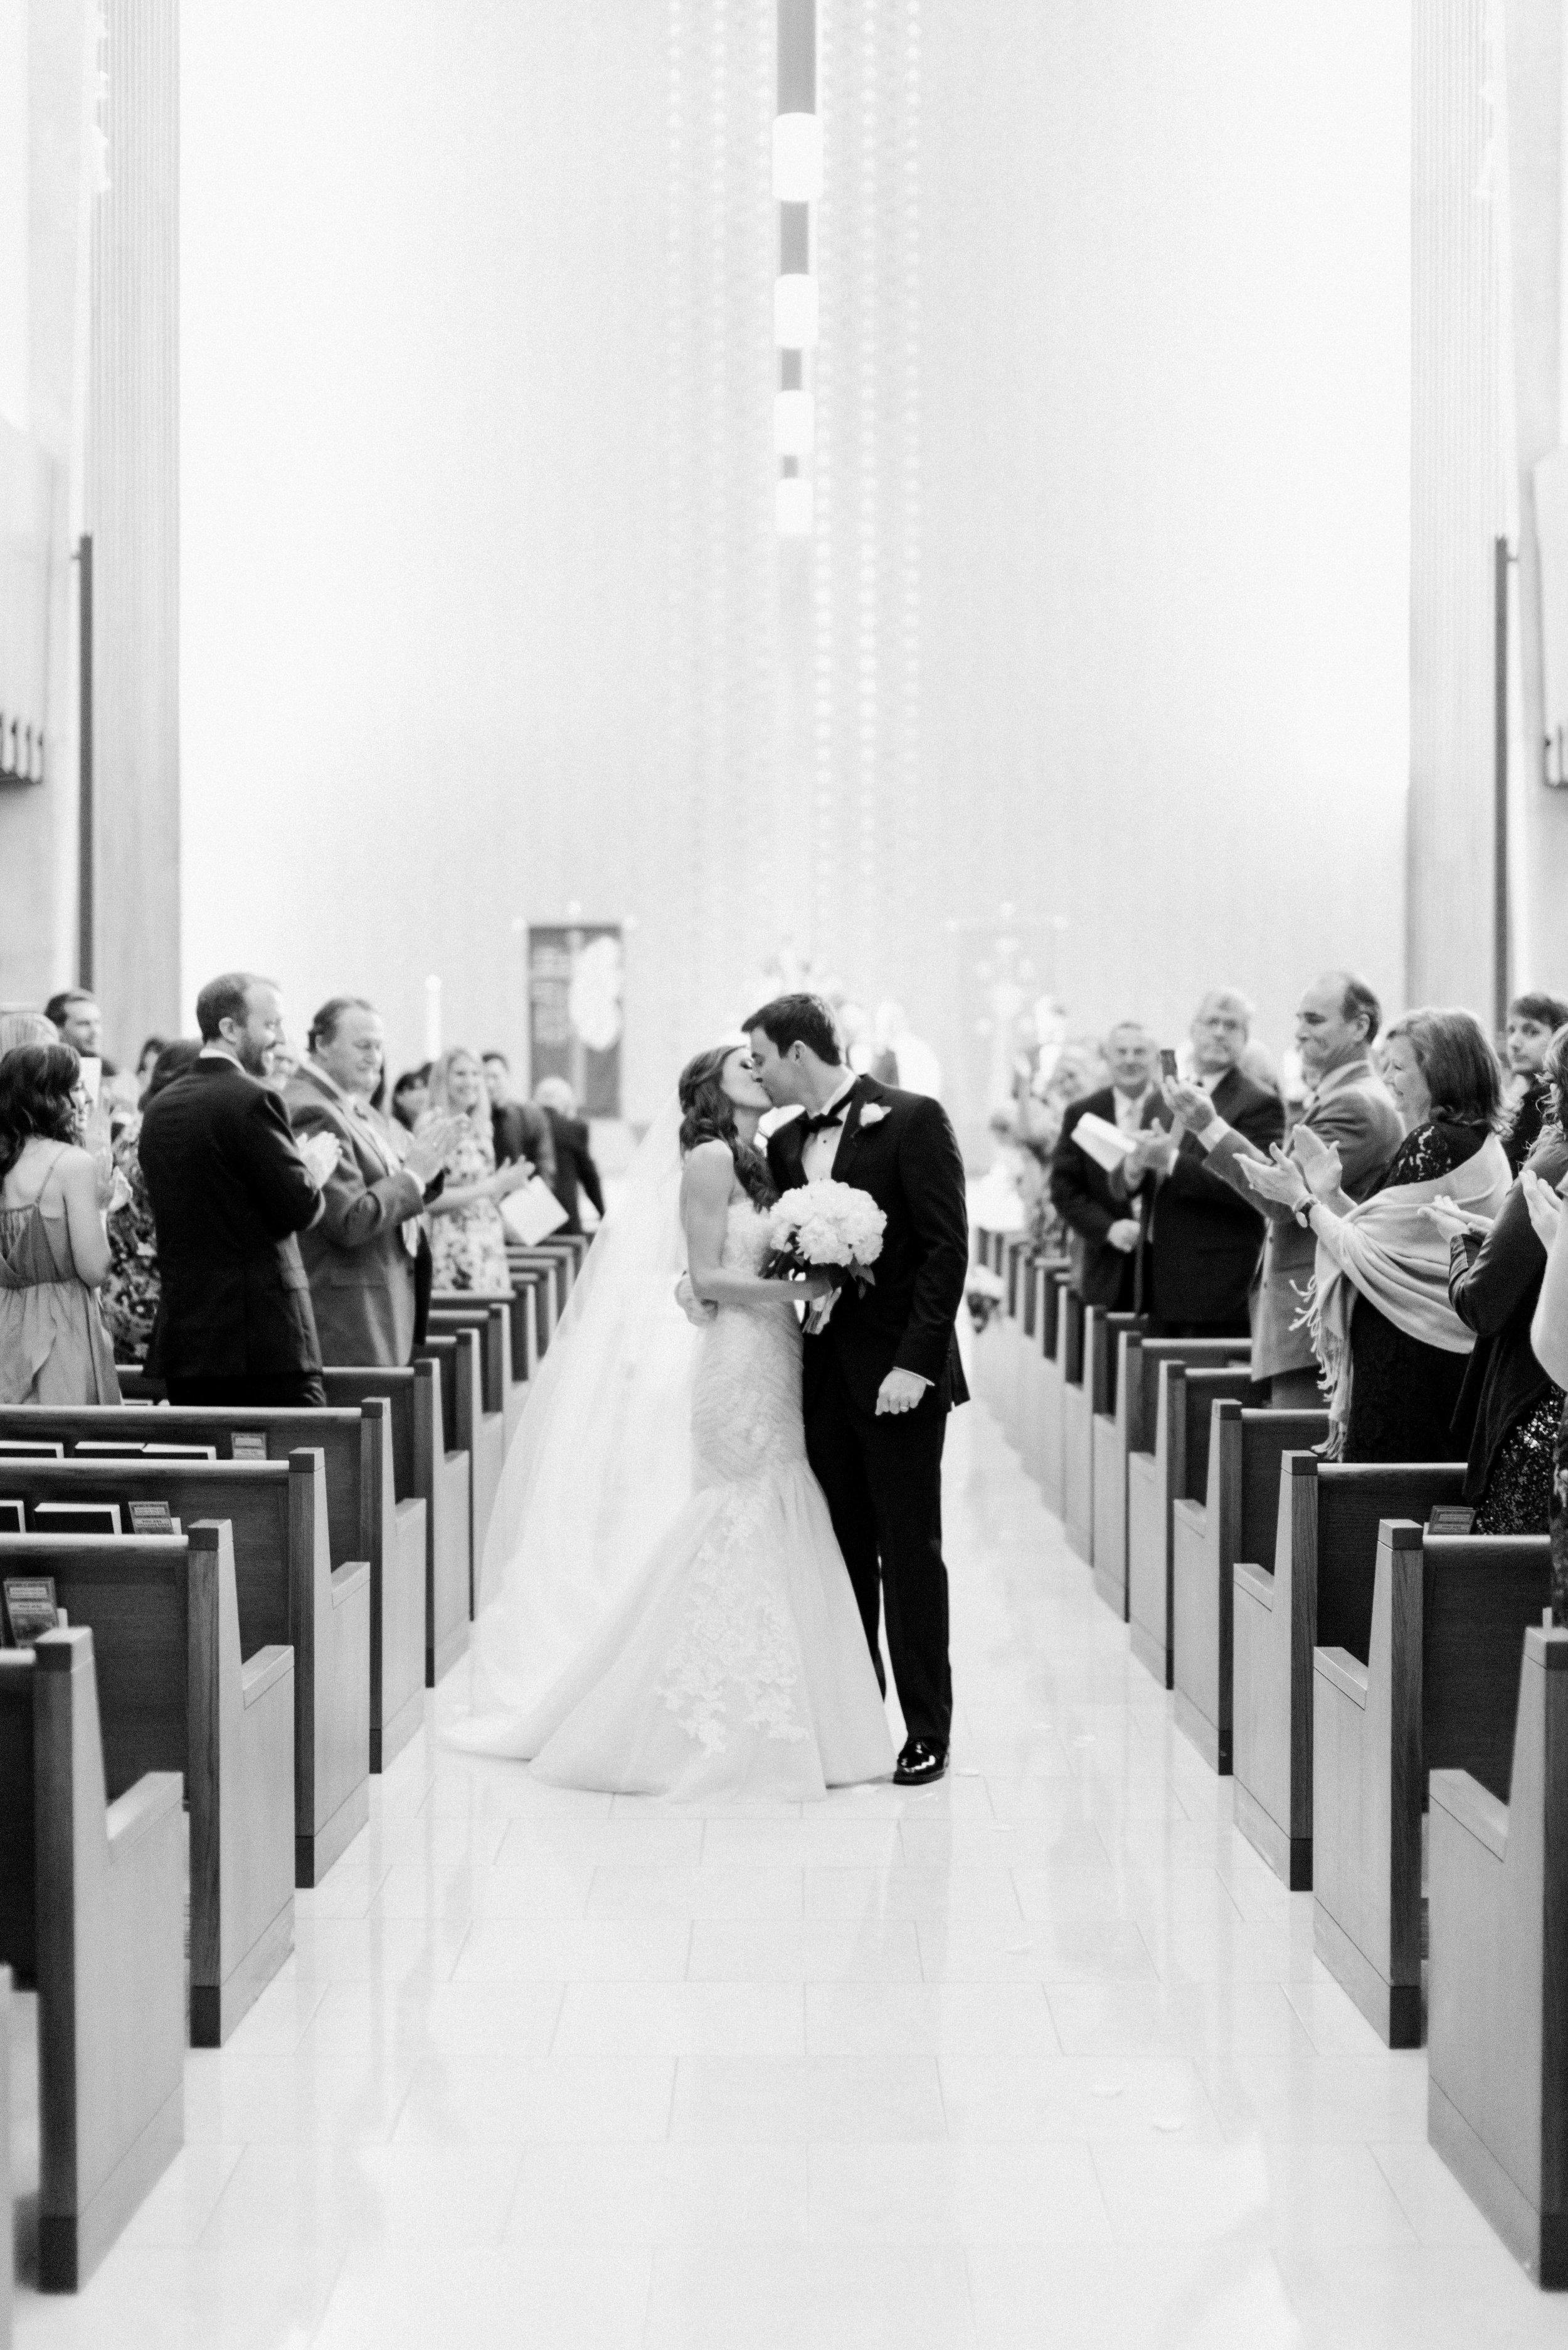 St.-Philip-Presbyterian-Church-Houston-Wedding-Ceremony-The-Junior-League-Of-Houston-Reception-Dana-Fernandez-Photography-Fine-Art-Film-26.jpg